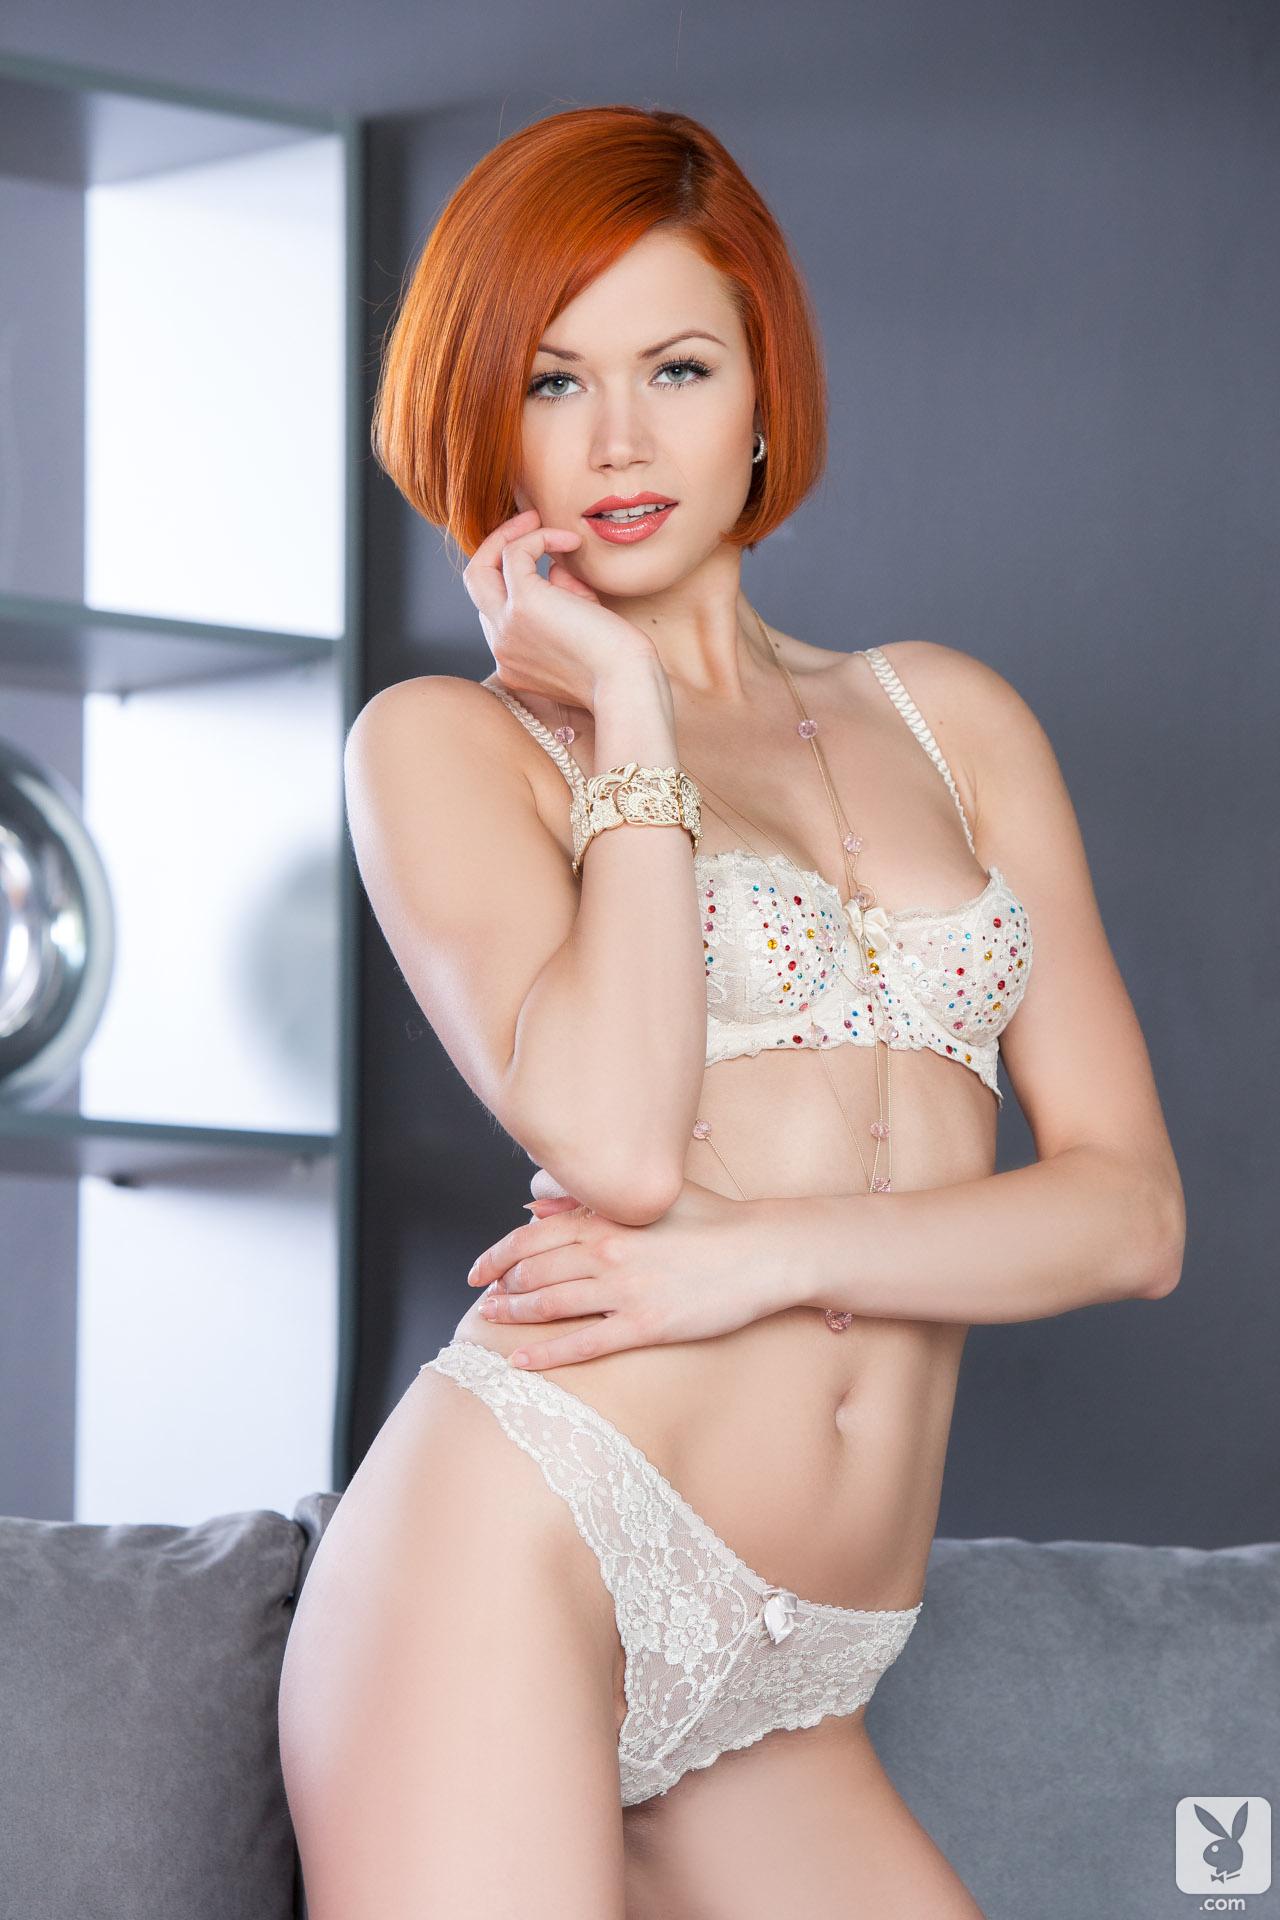 kamila-hermanova-redhead-naked-white-lingerie-playboy-07